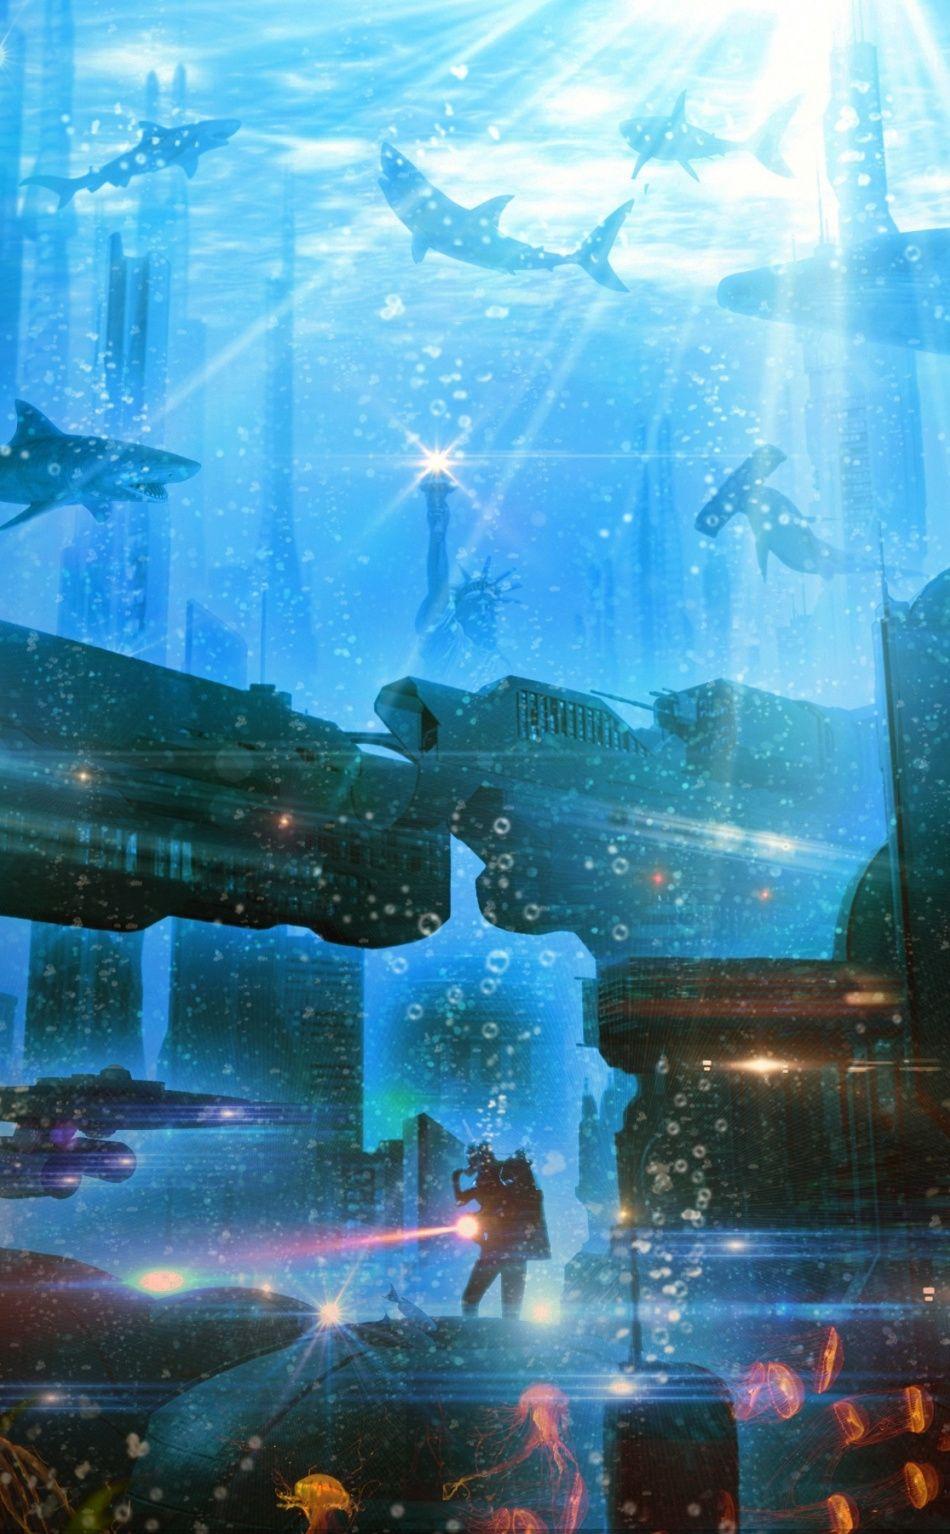 Underwater City Atlantis 950x1534 Wallpaper Underwater City Cityscape Wallpaper Lost City Of Atlantis